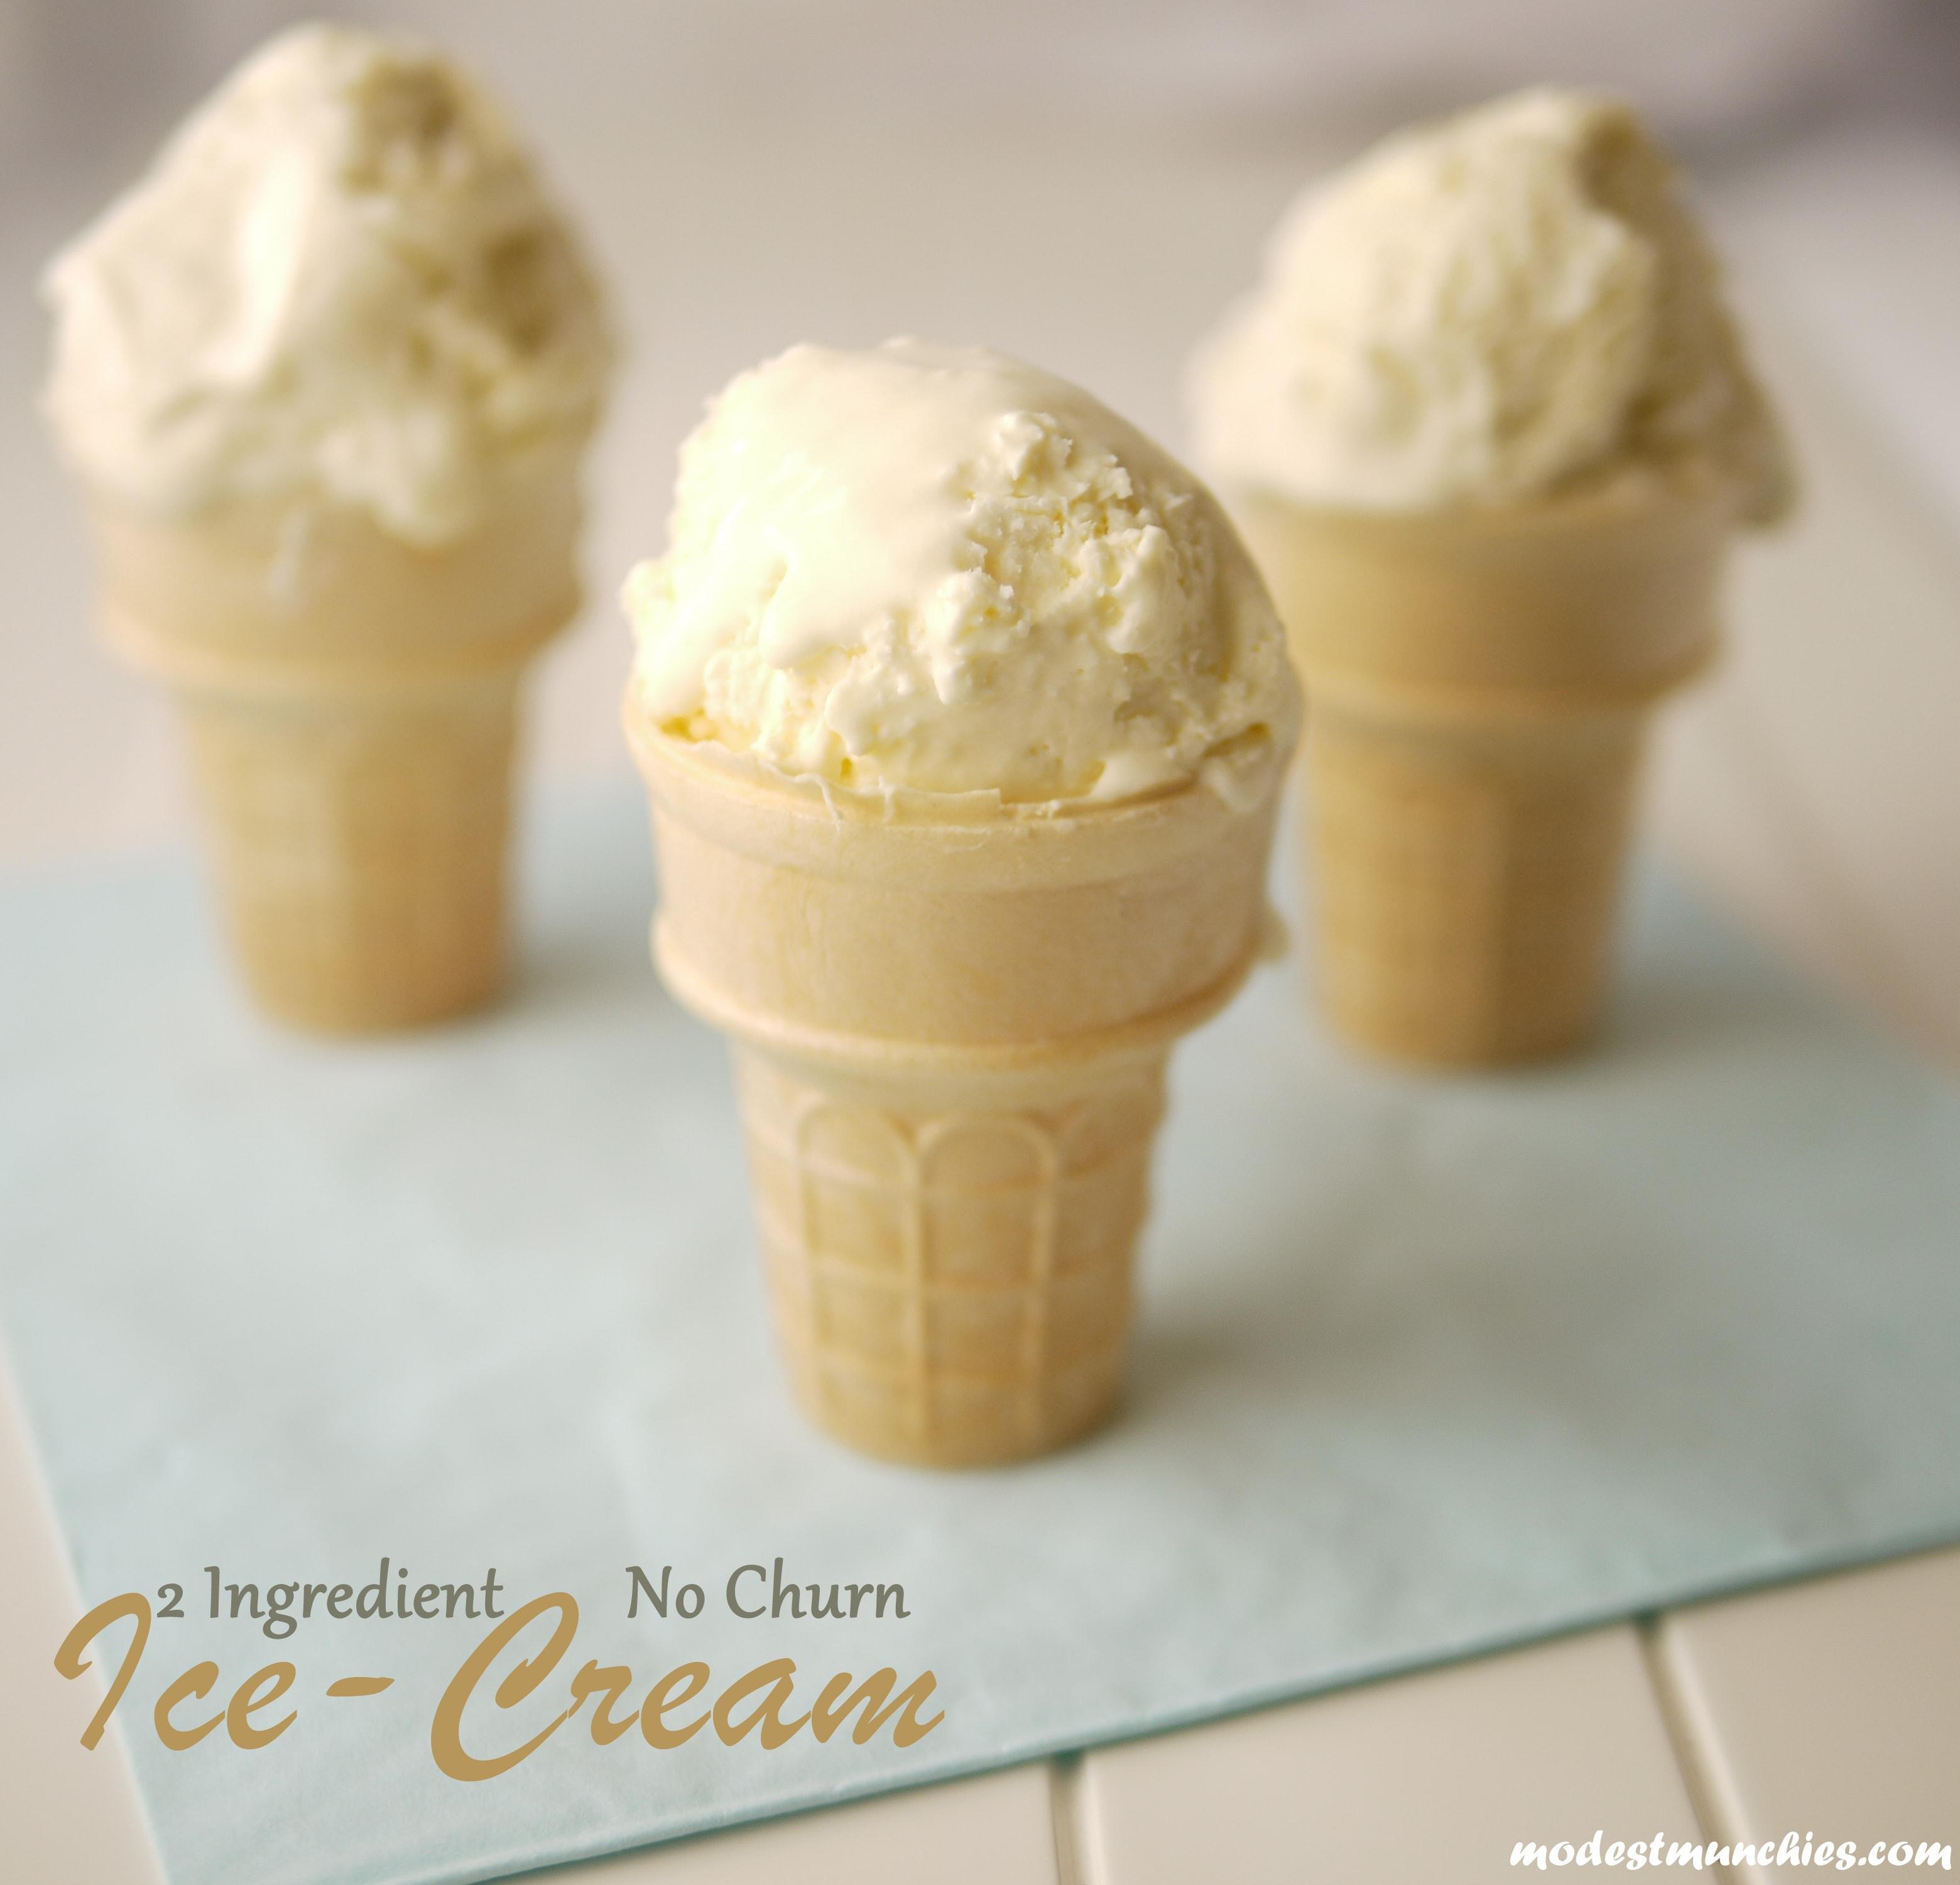 2 Ingredient no churn ice cream